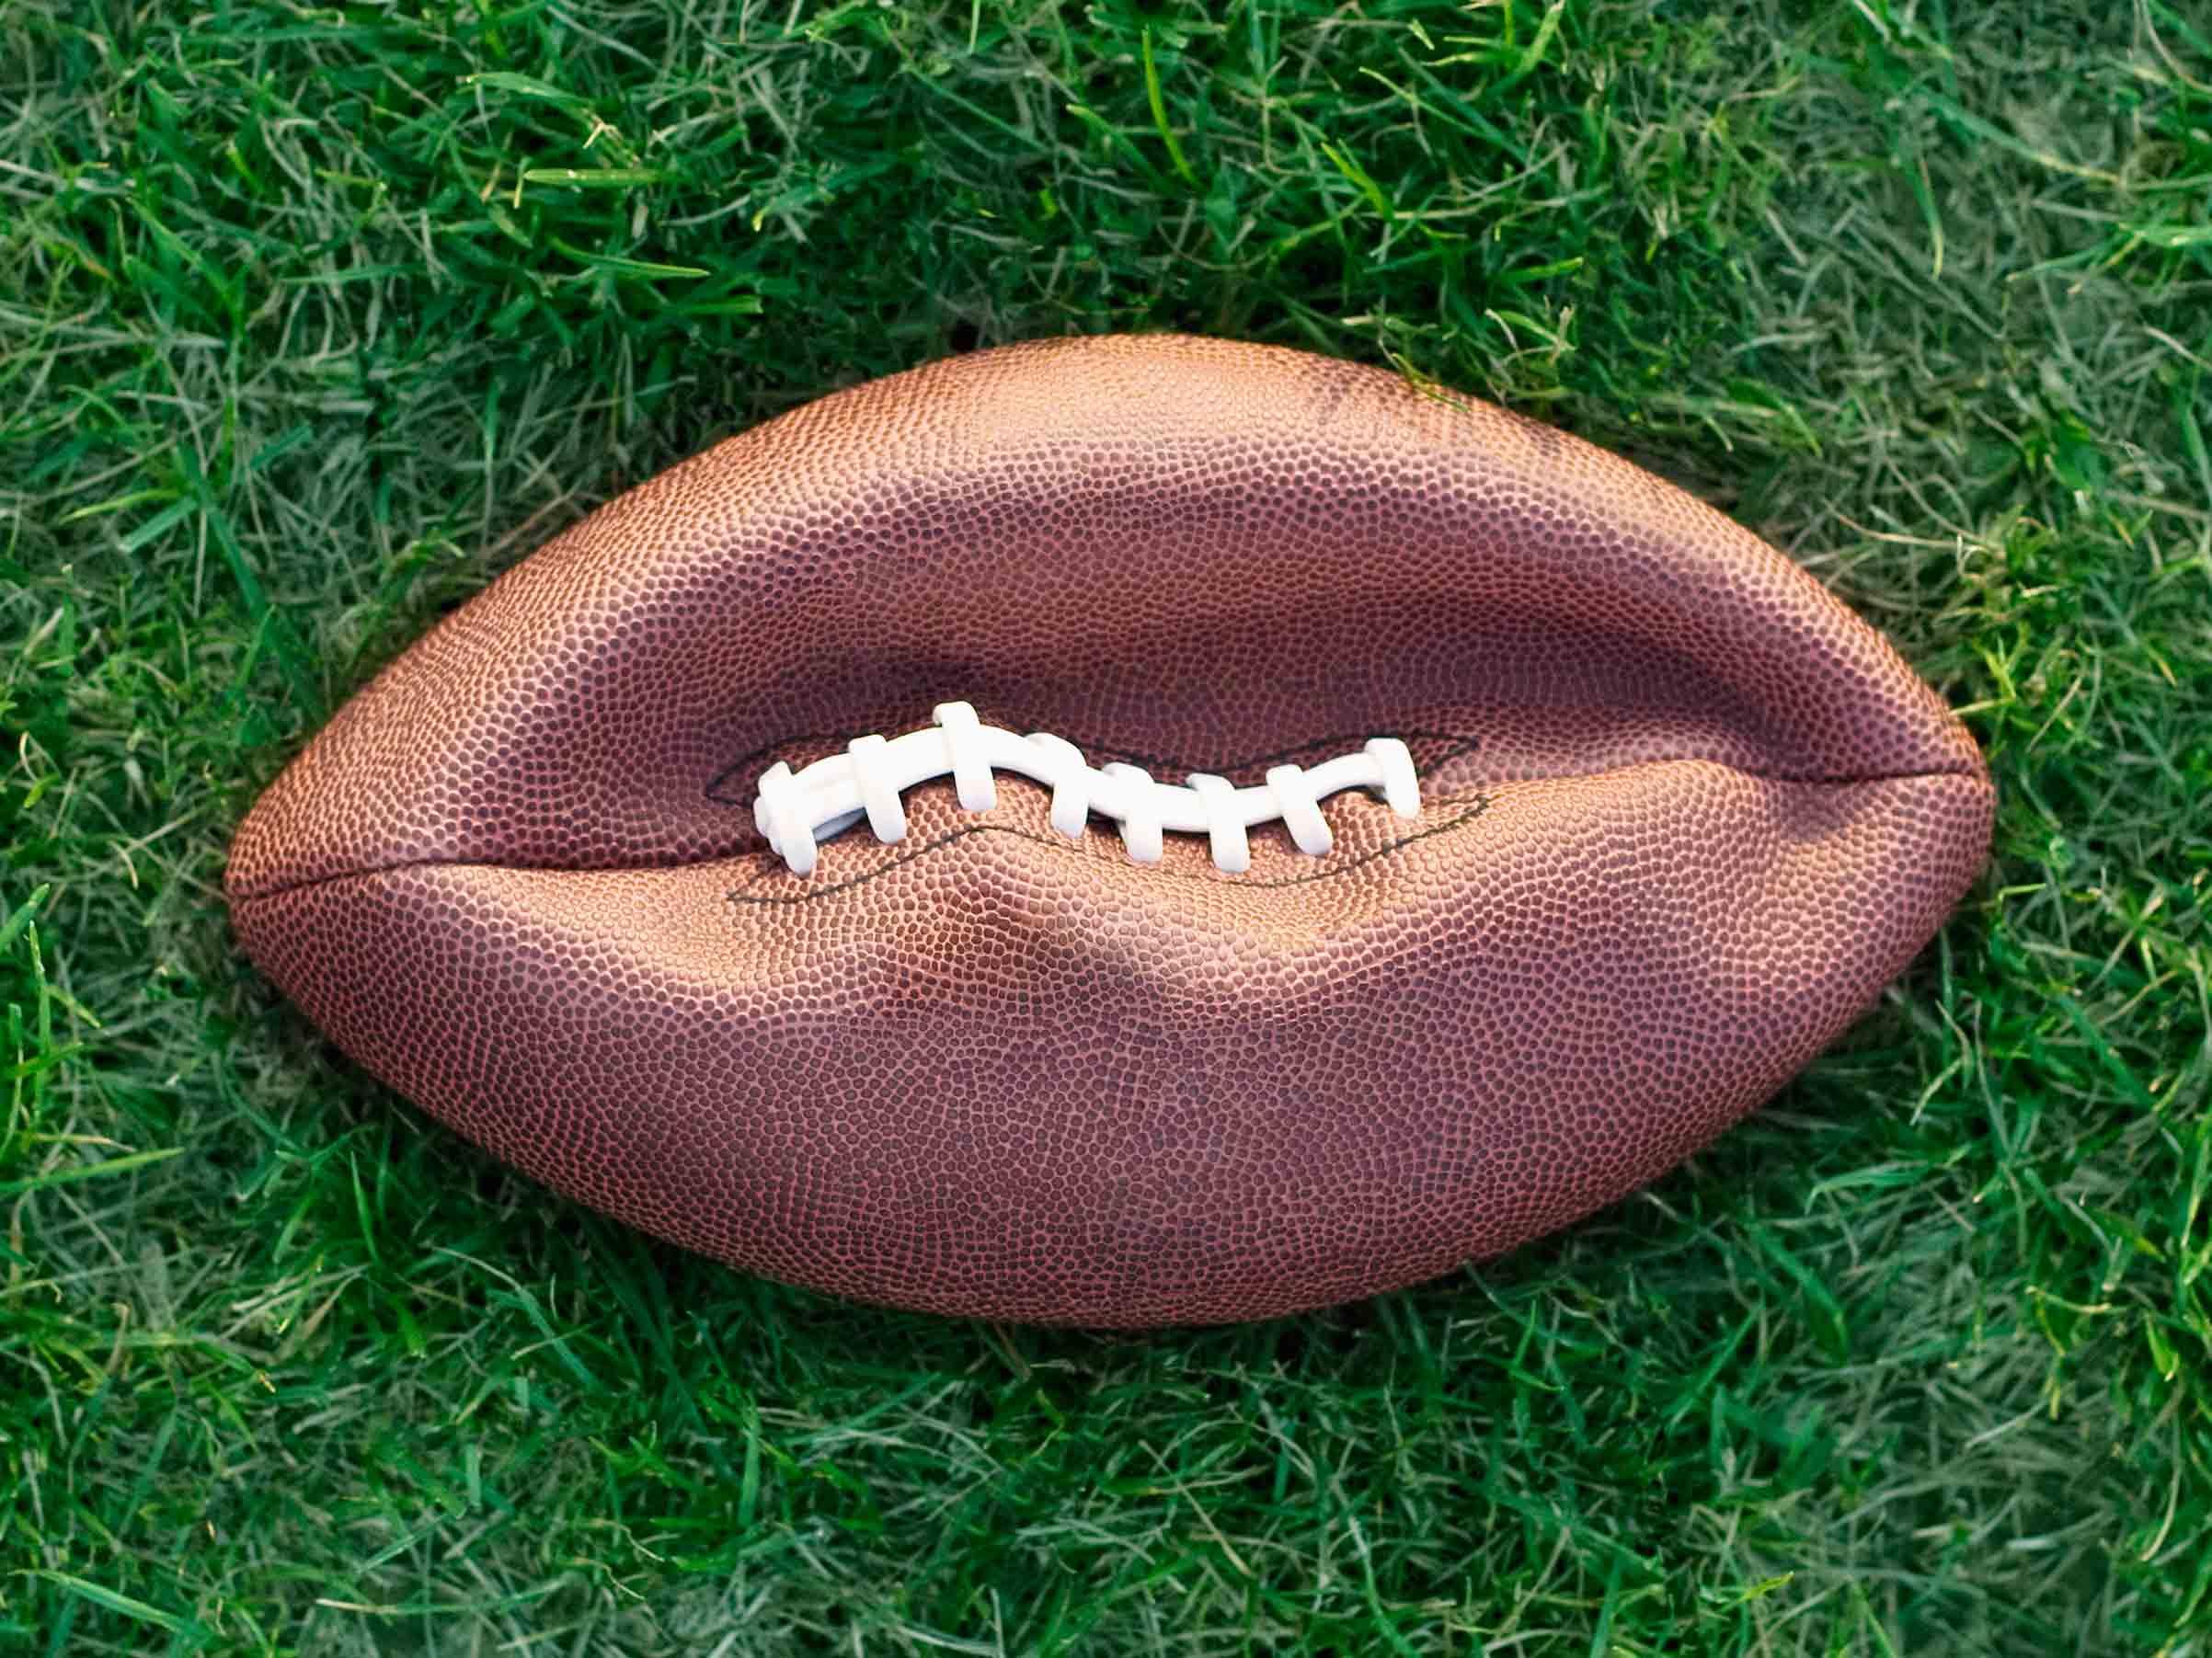 Deflated American football on grass